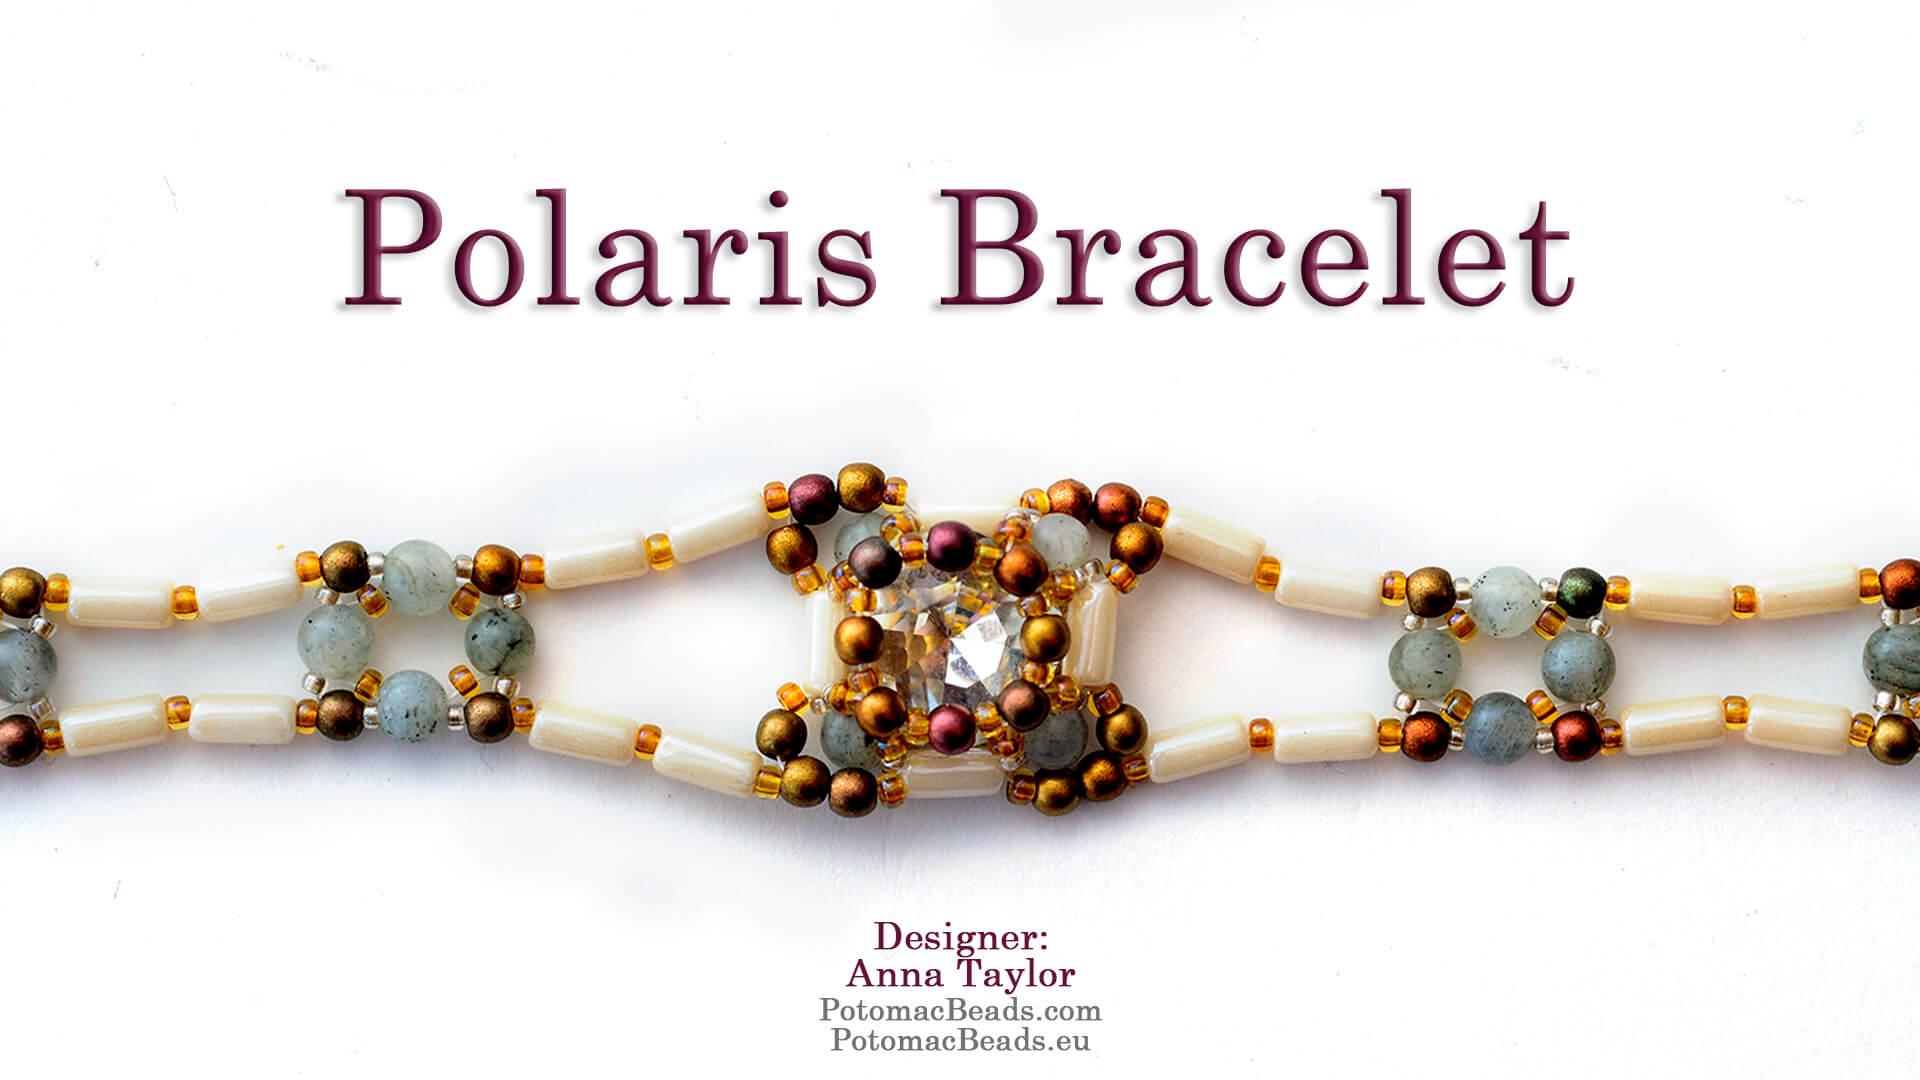 How to Bead Jewelry / Beading Tutorials & Jewel Making Videos / Bracelet Projects / Polaris Bracelet Tutorial